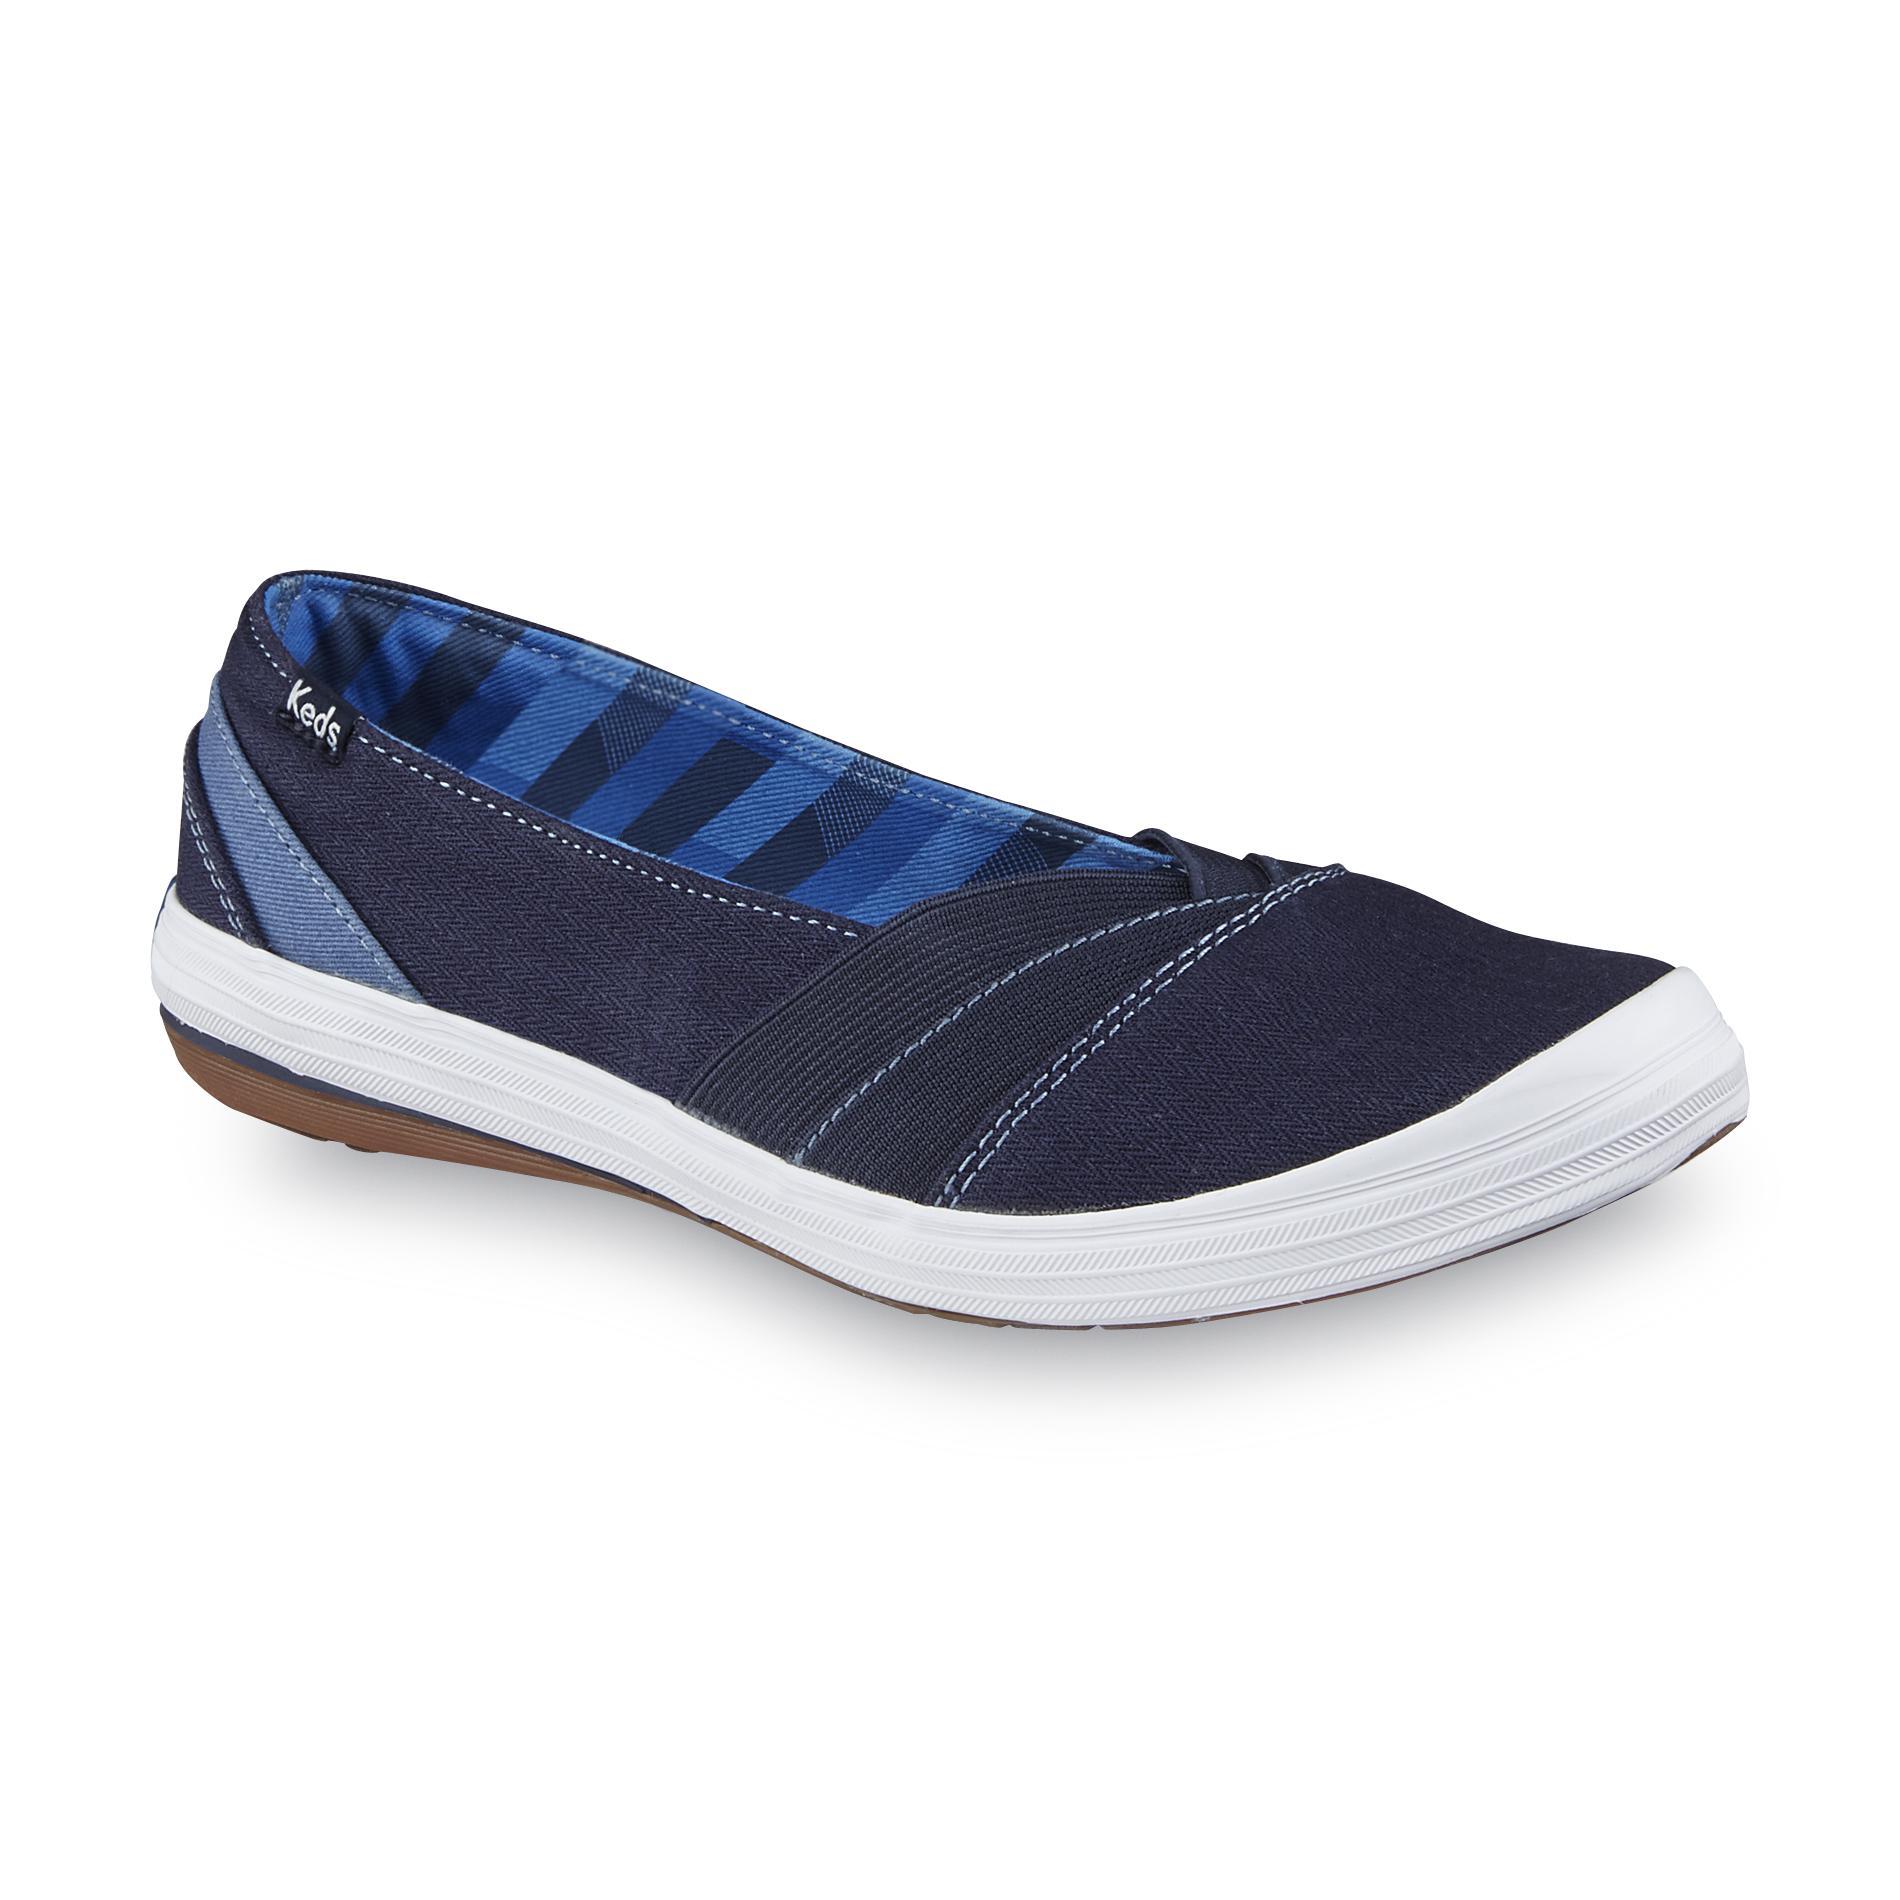 keds shoes keds womenu0027s whimsy navy slip-on shoe - shoes - womenu0027s shoes - womenu0027s  sneakers EDROMCL